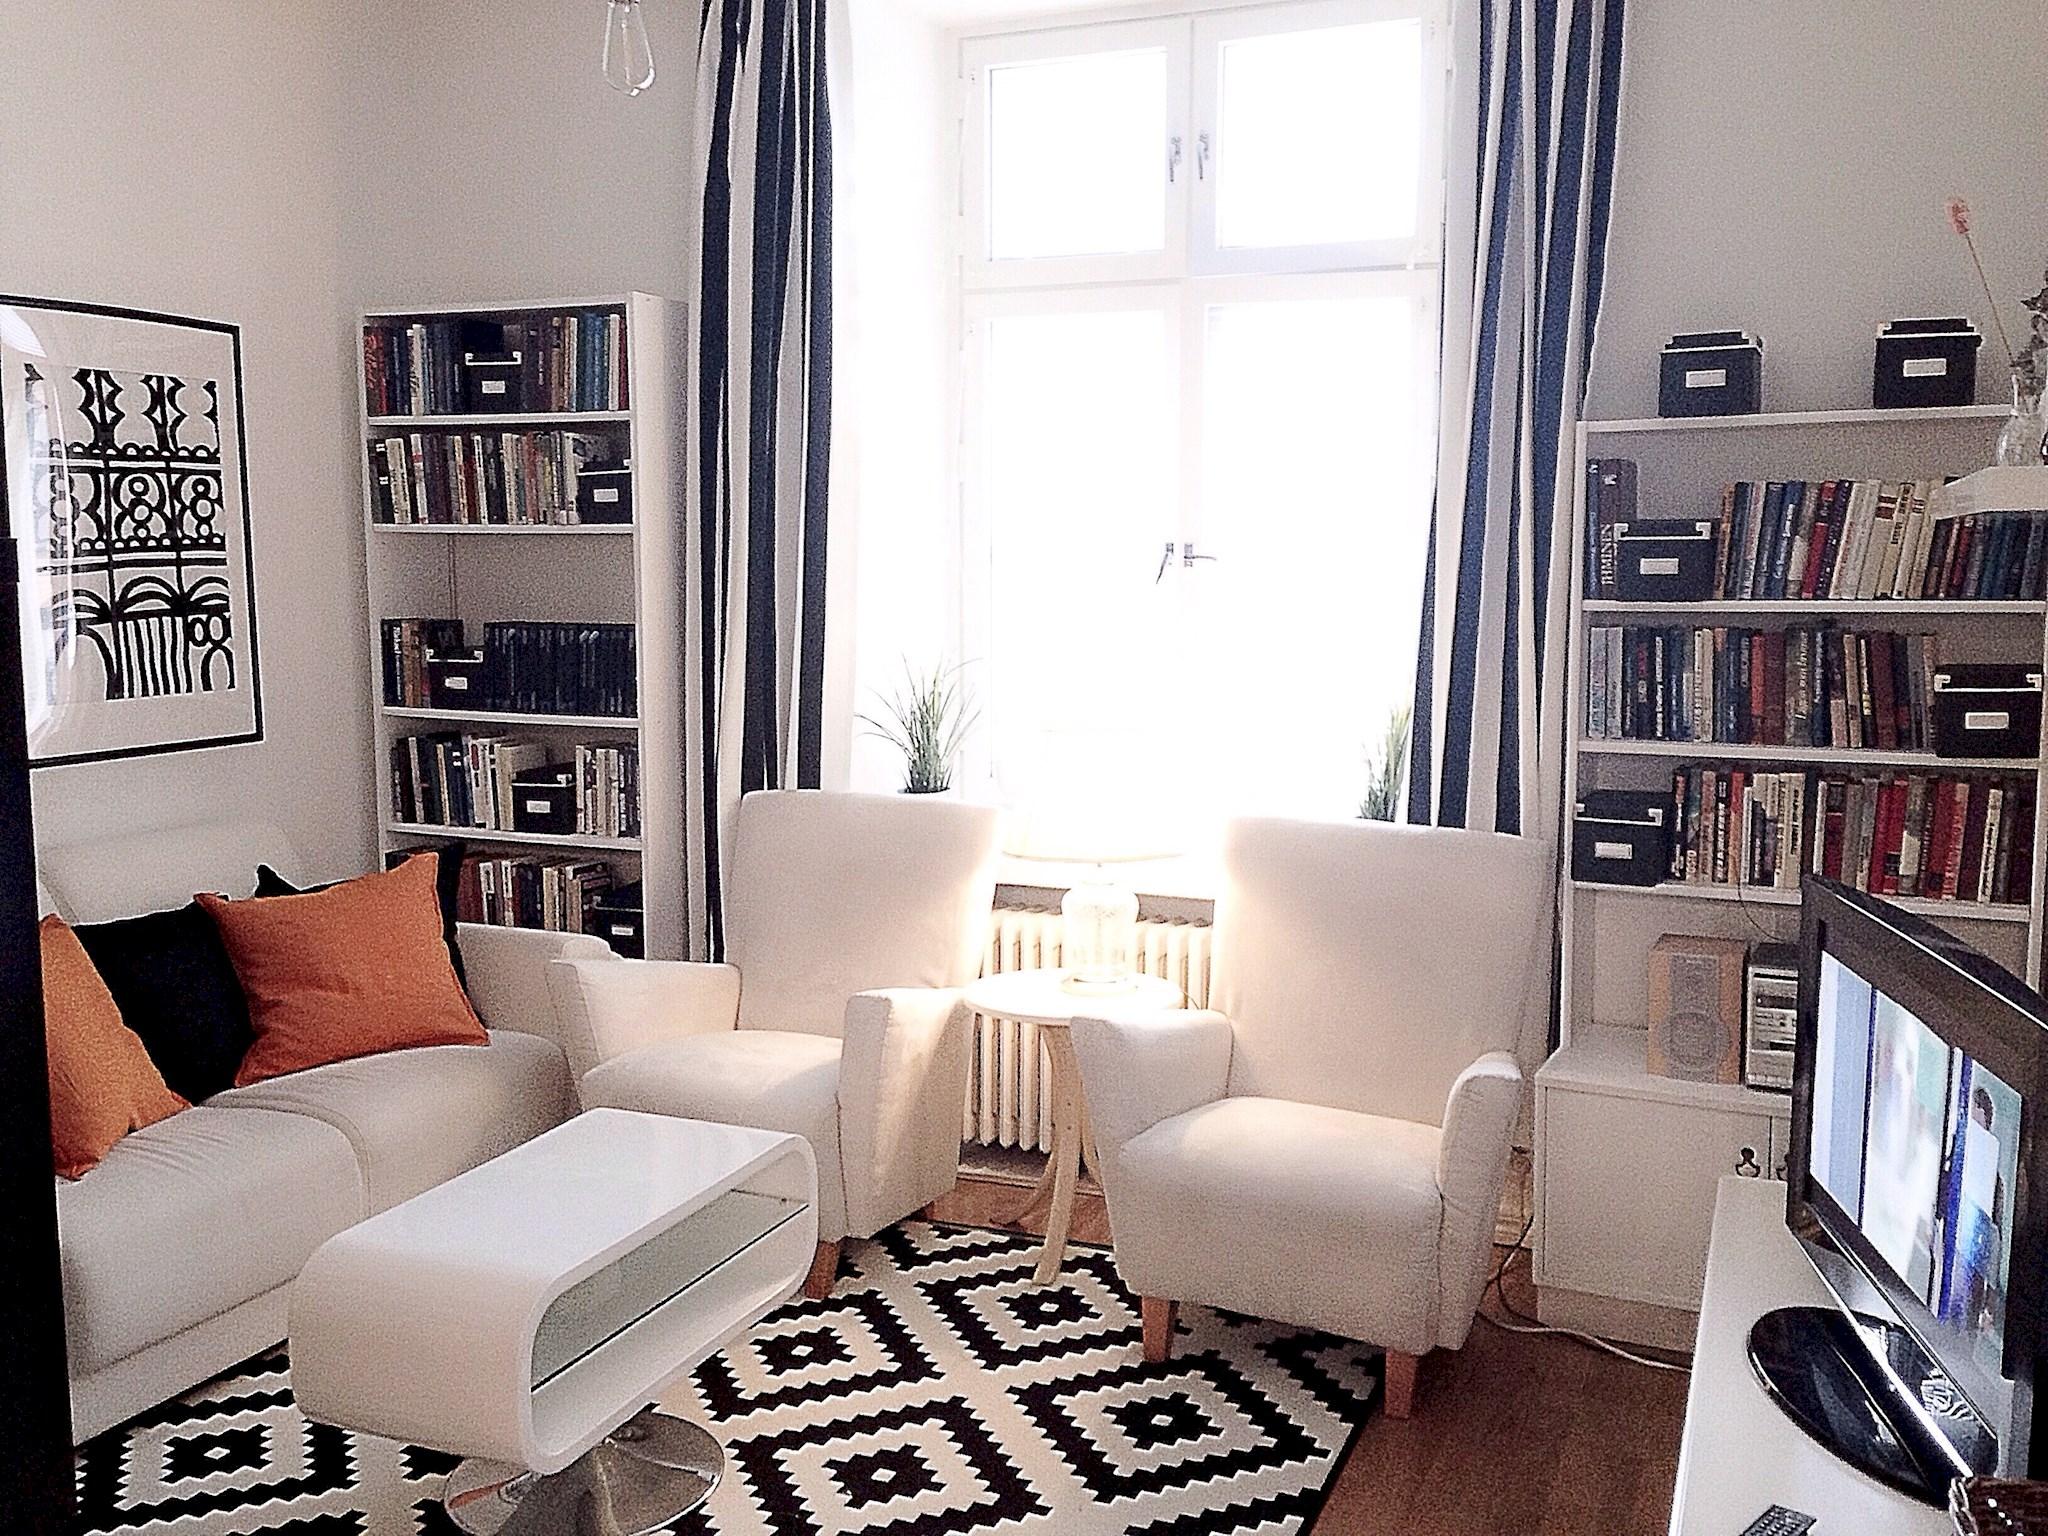 Helsinki, Finland Apartment #RU151835